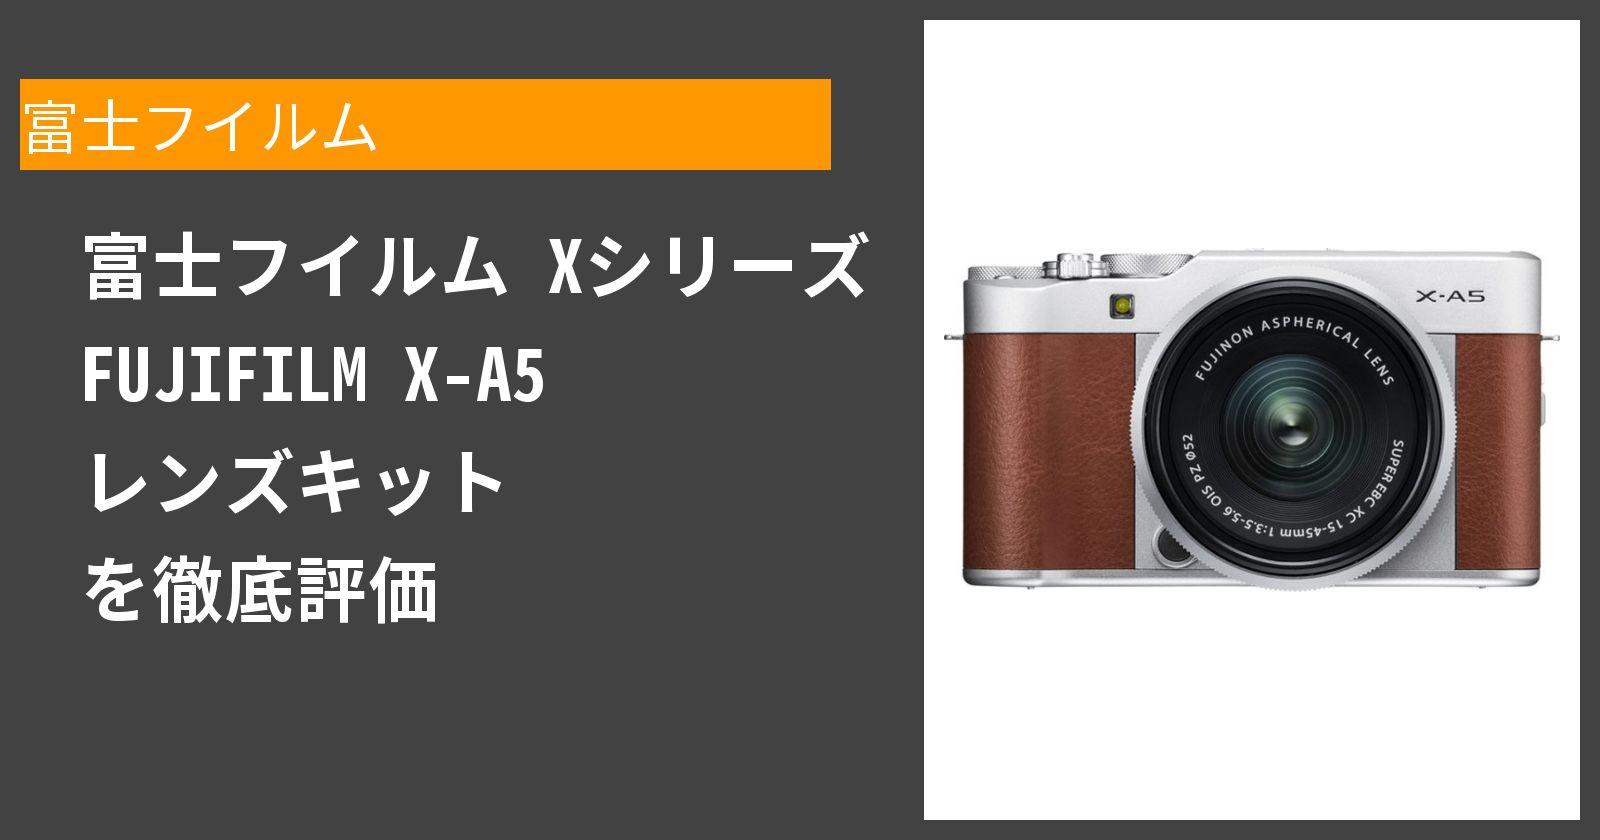 FUJIFILM X-A5 レンズキットを徹底評価